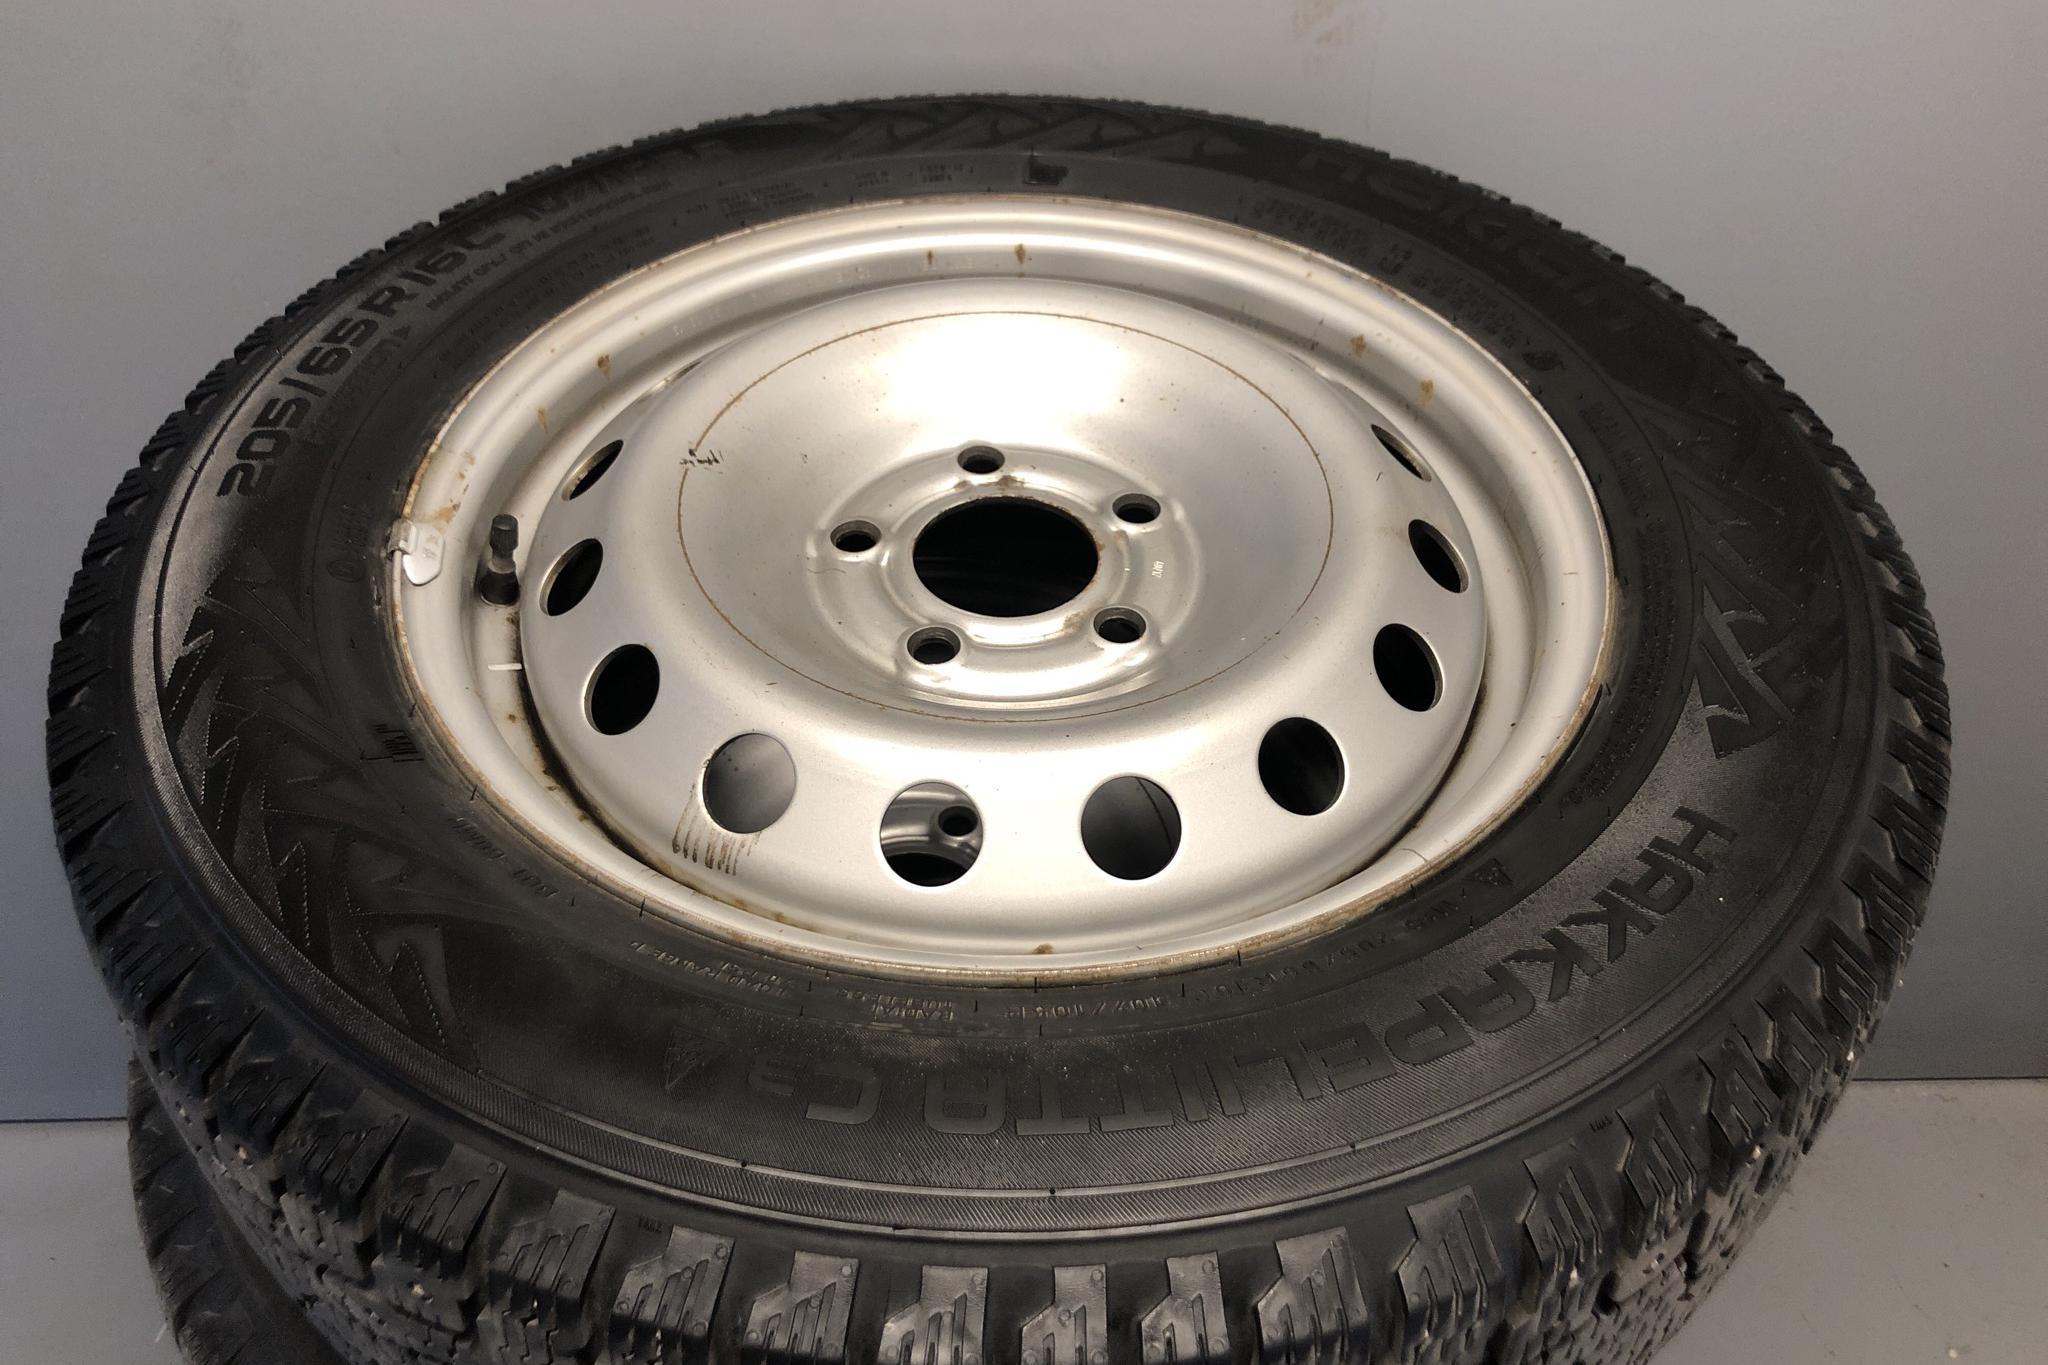 Nissan Primastar 2.0 dCi (114hk) - 12 444 mil - Manuell - silver - 2014